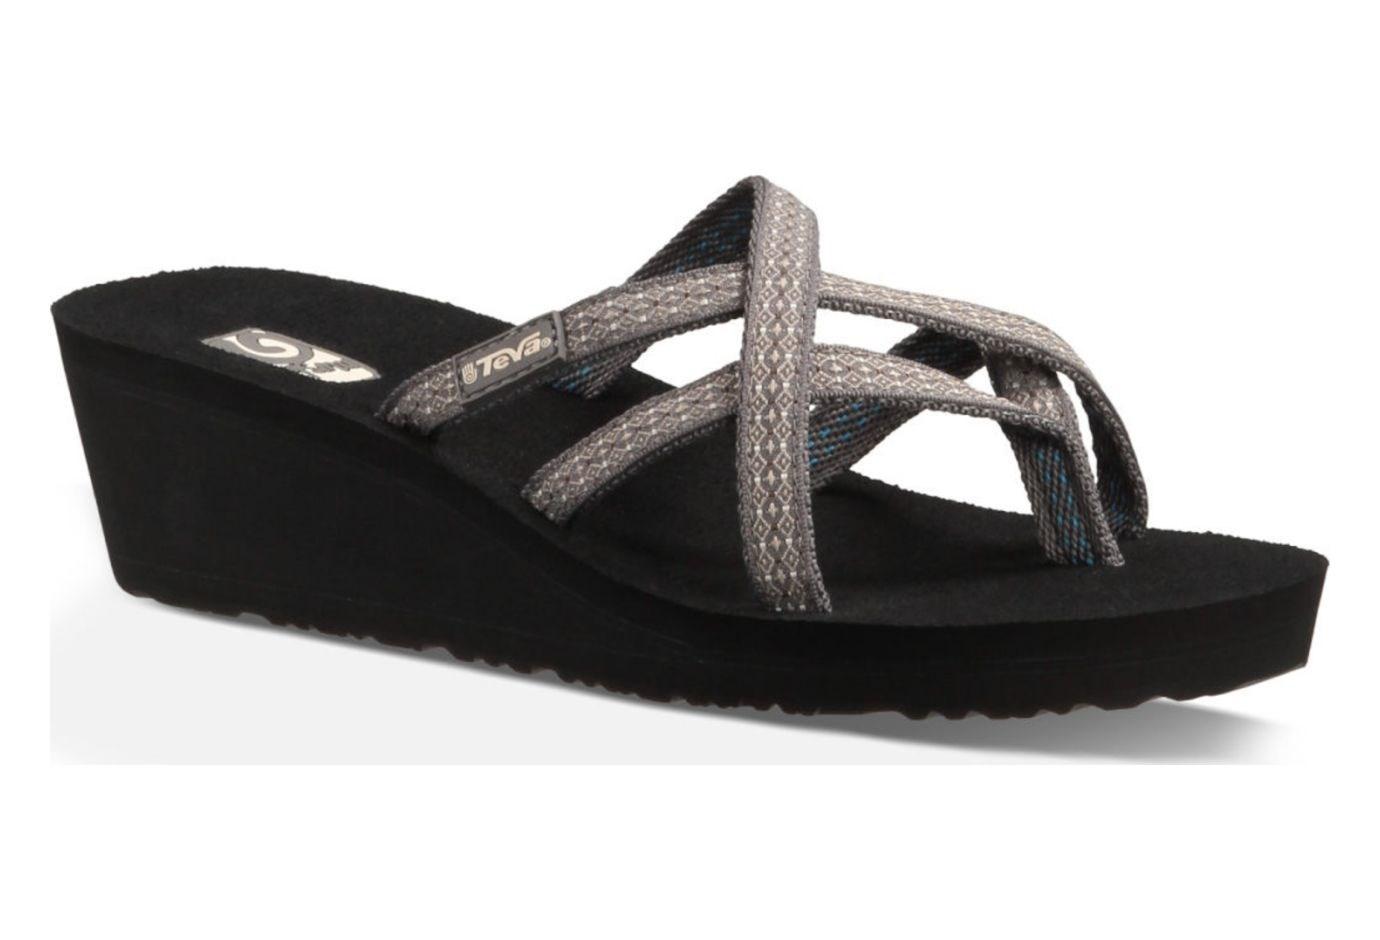 Womens sandals wedges - Teva Mush Mandalyn Wedge Ola 2 Sandals For Women